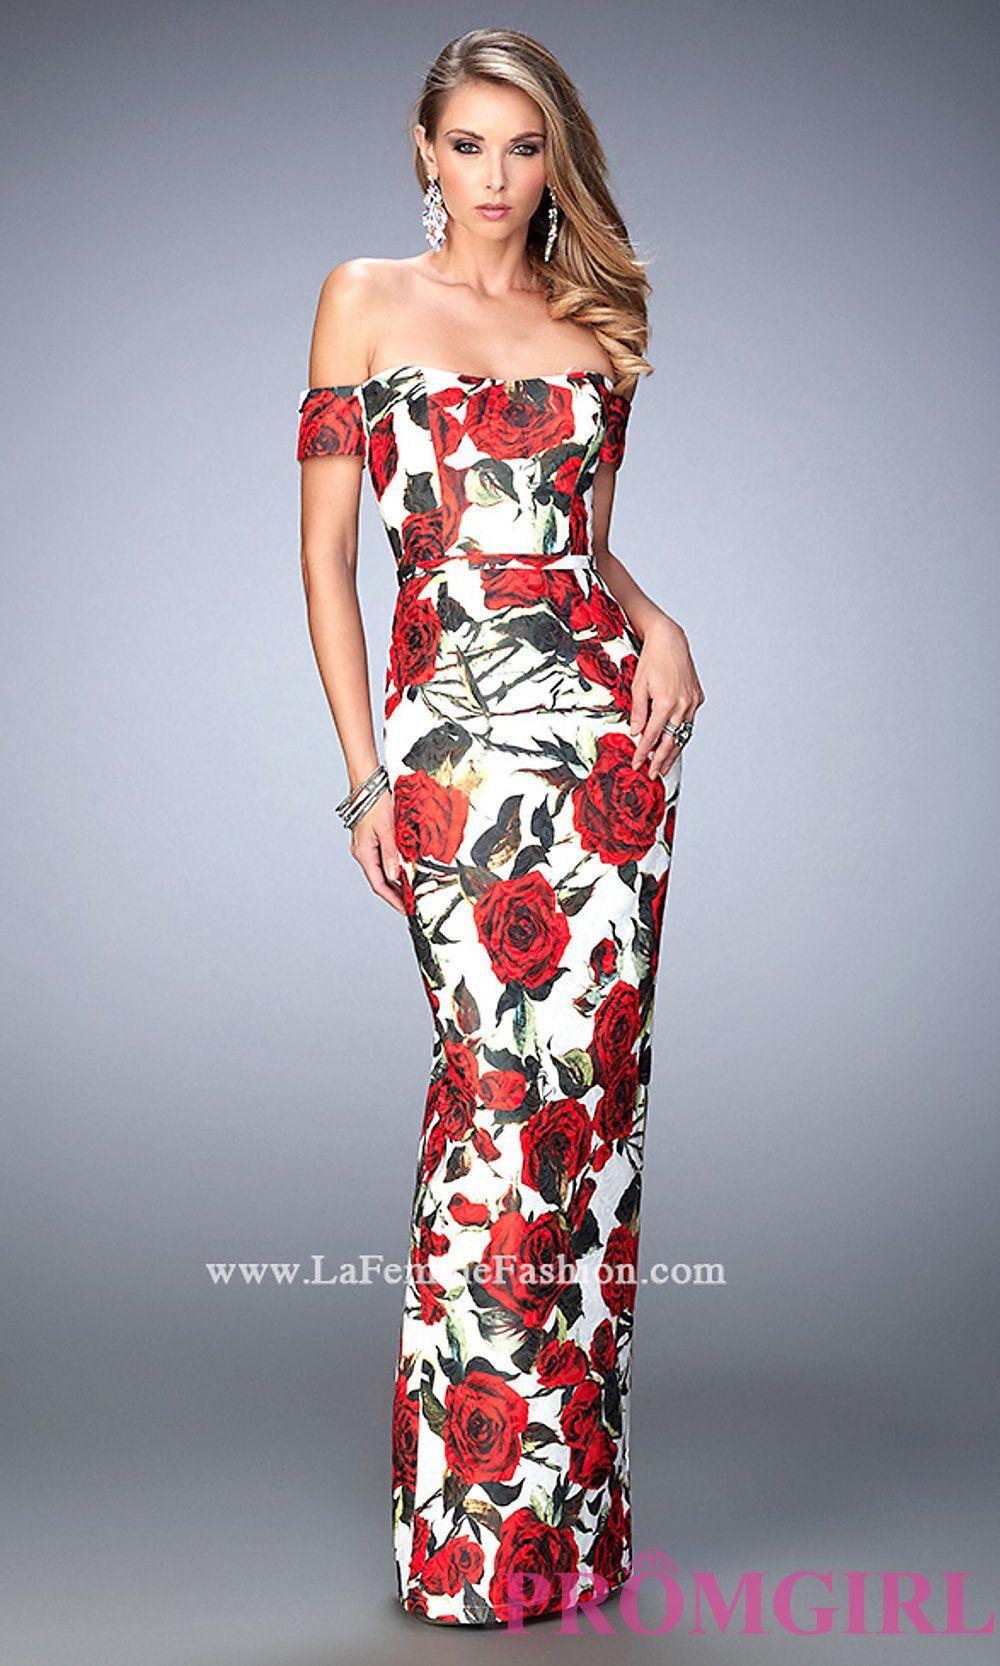 3b3043db15 Off the Shoulder Floral Print La Femme Dress Style  LF-22671